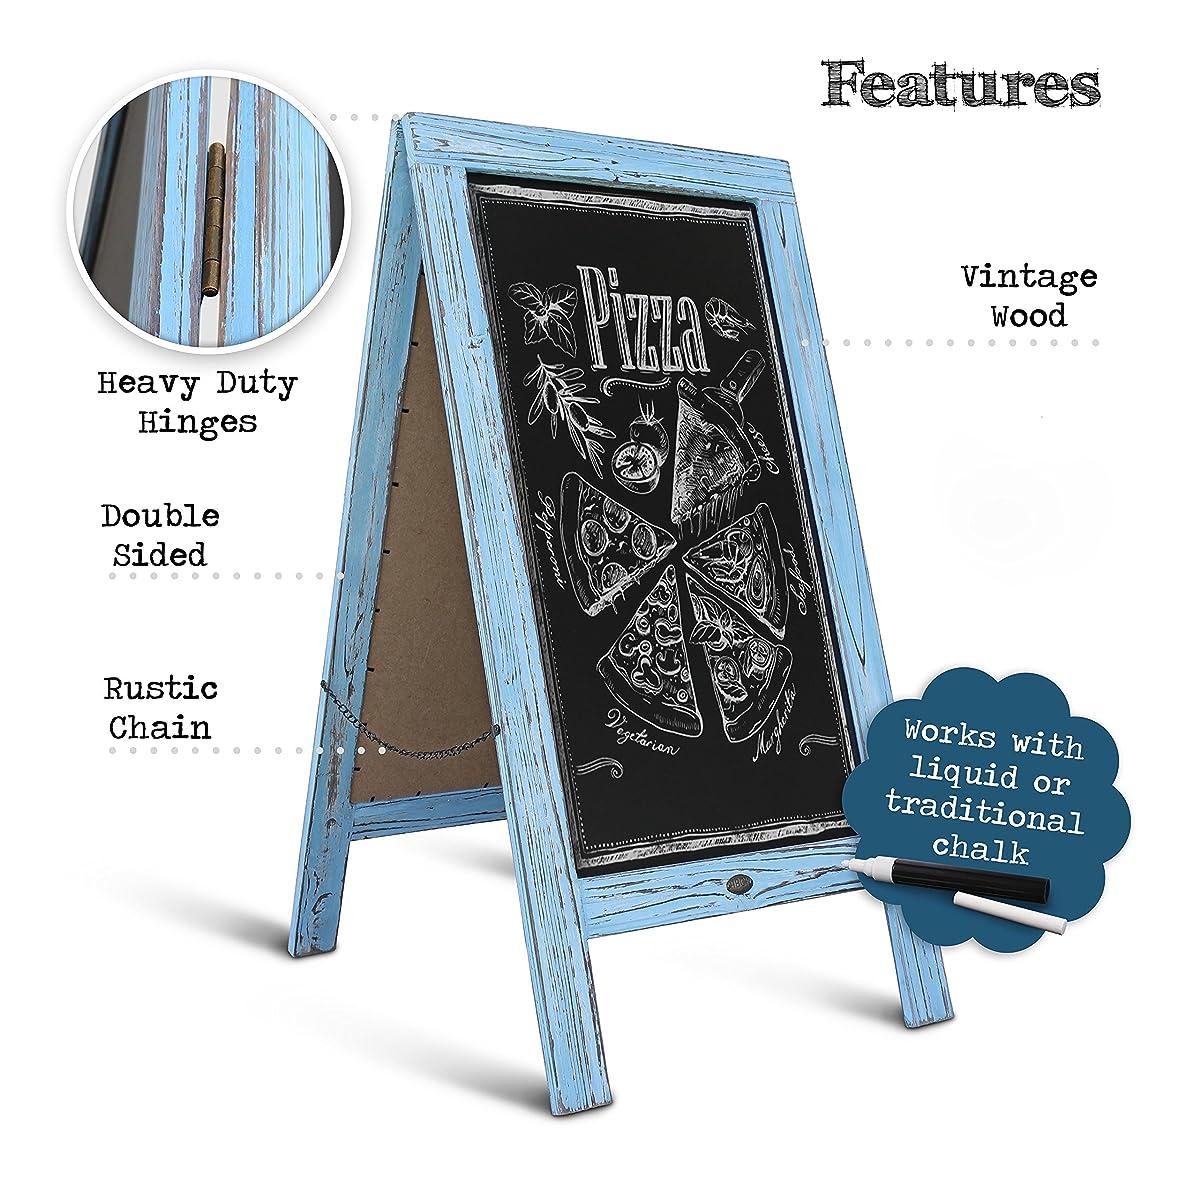 Rustic Robin Blue A-Frame Chalkboard / Sidewalk Chalkboard Sign / Large Sturdy Sandwich Board / A Frame Restaurant Message Board / Freestanding Wooden Menu Display Sign